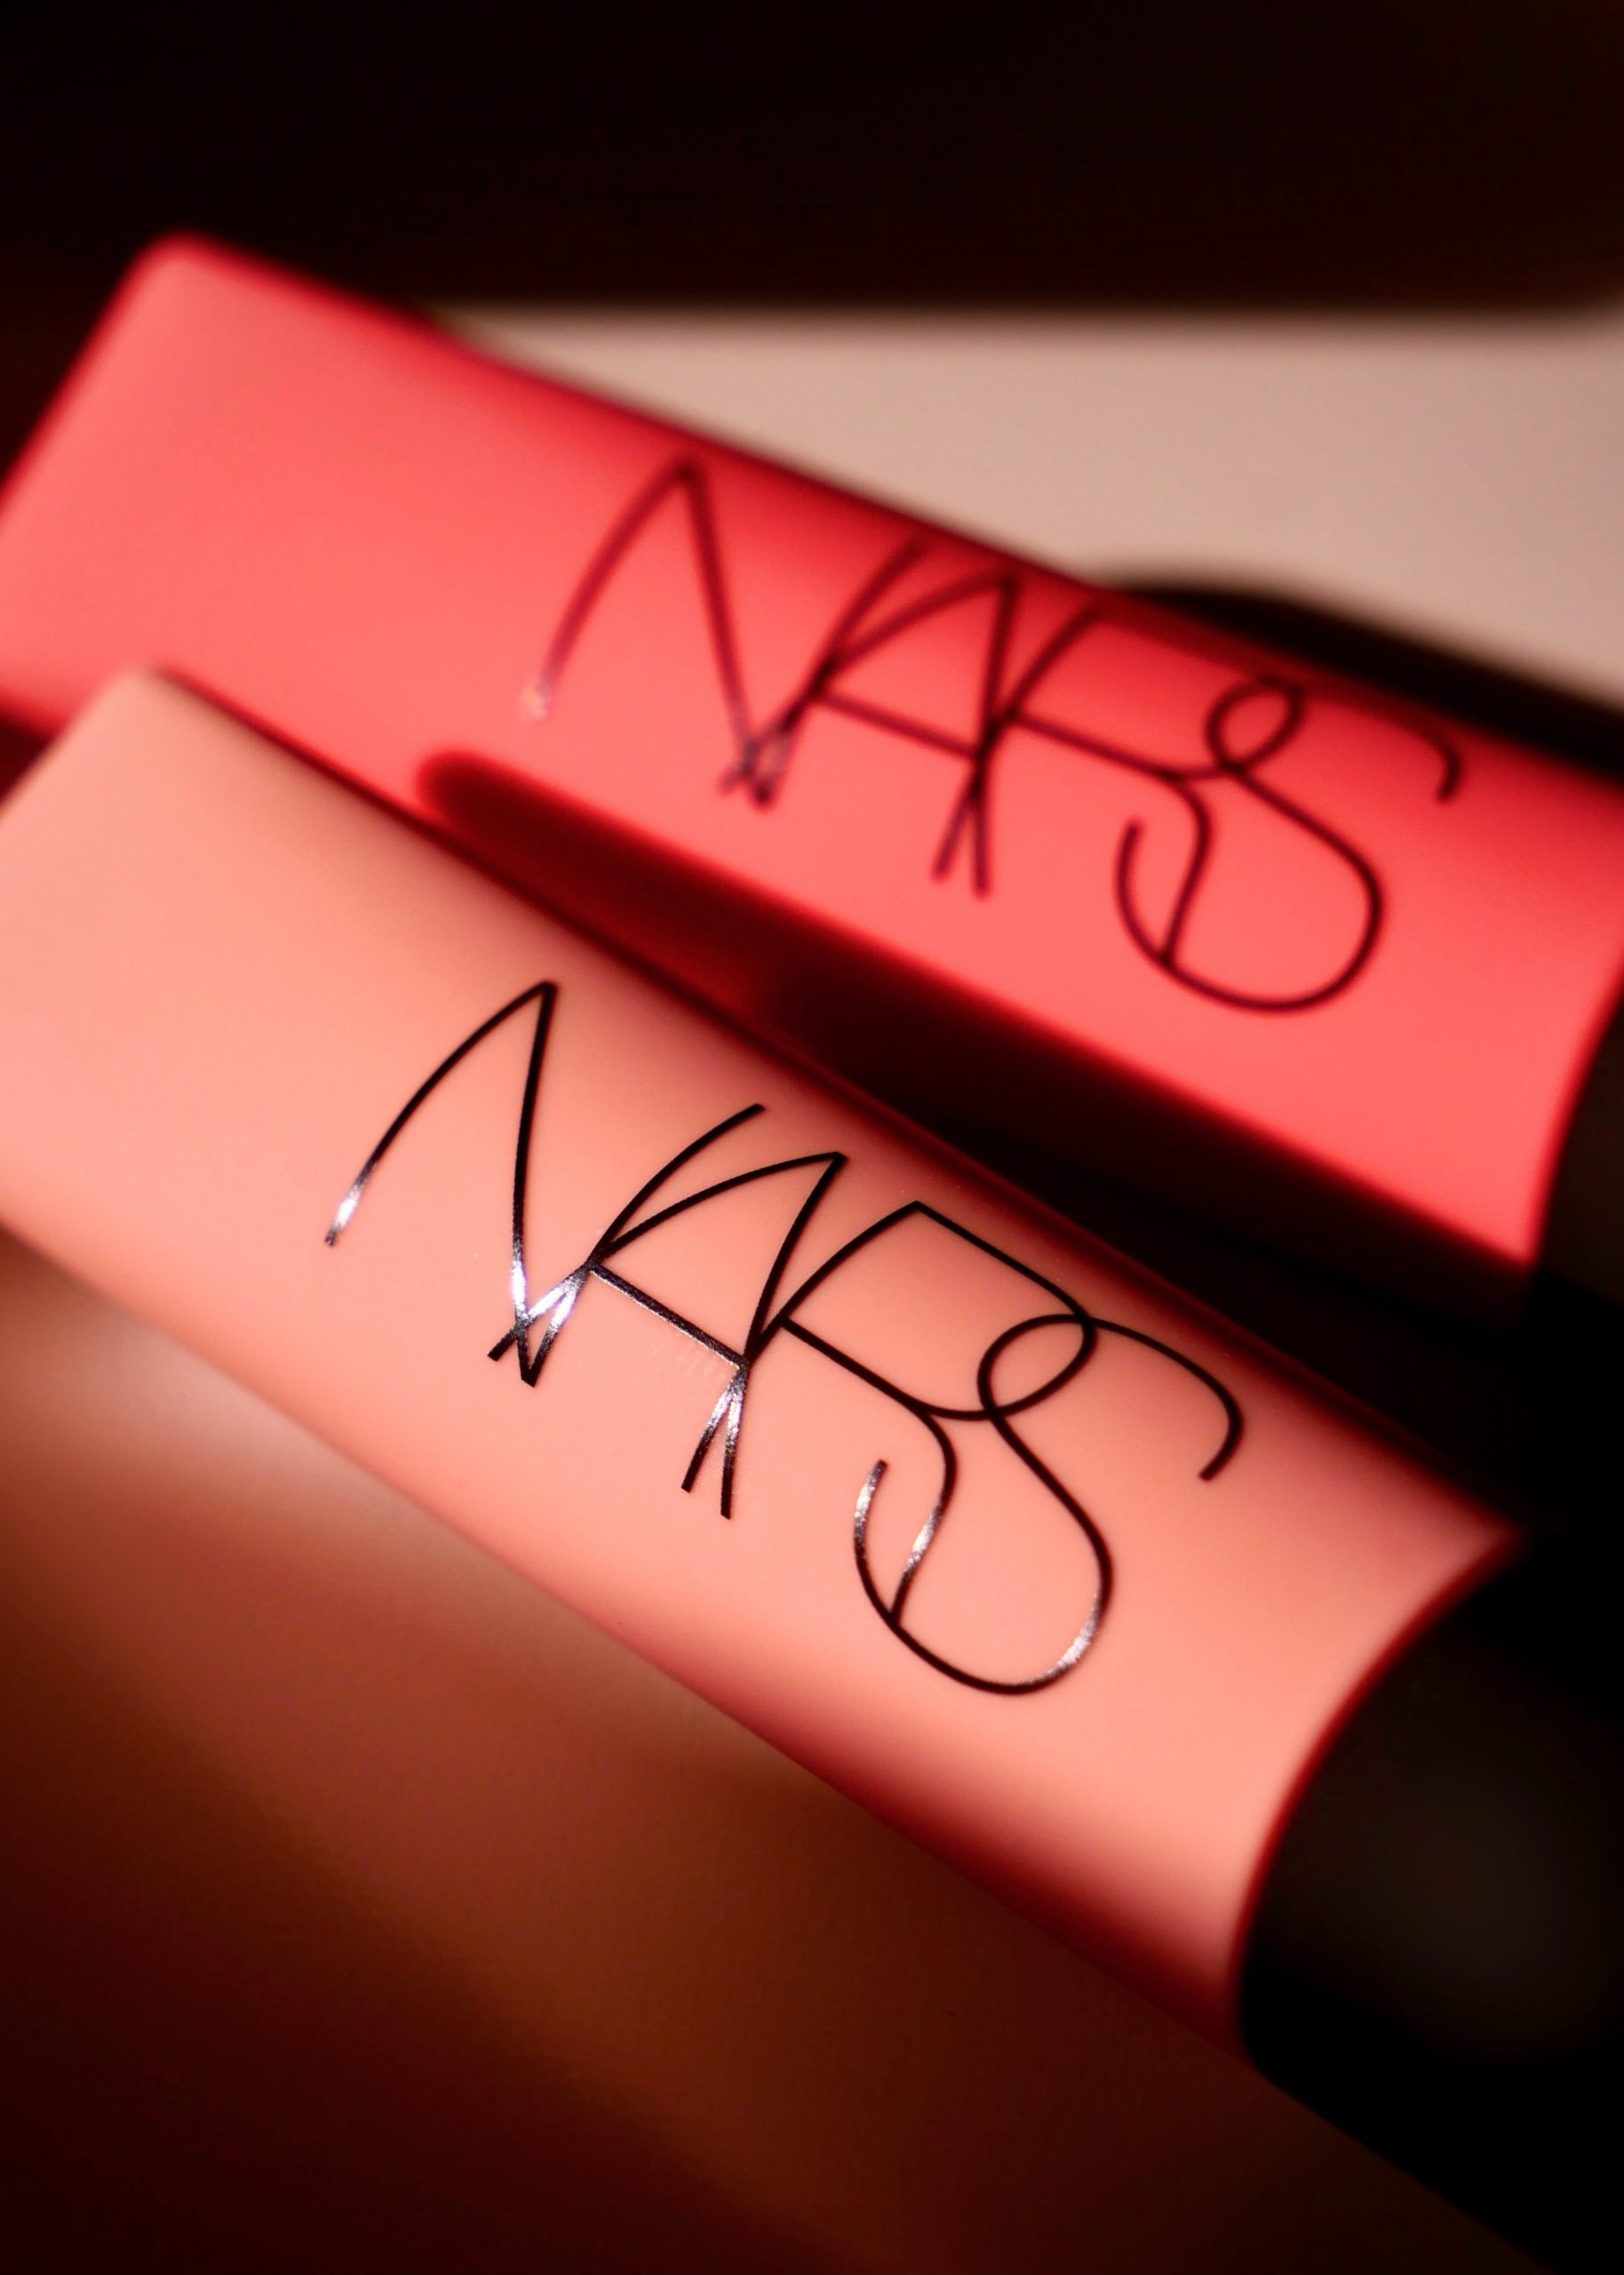 NARS Air Matte Lip Colour, All Yours, Joyride